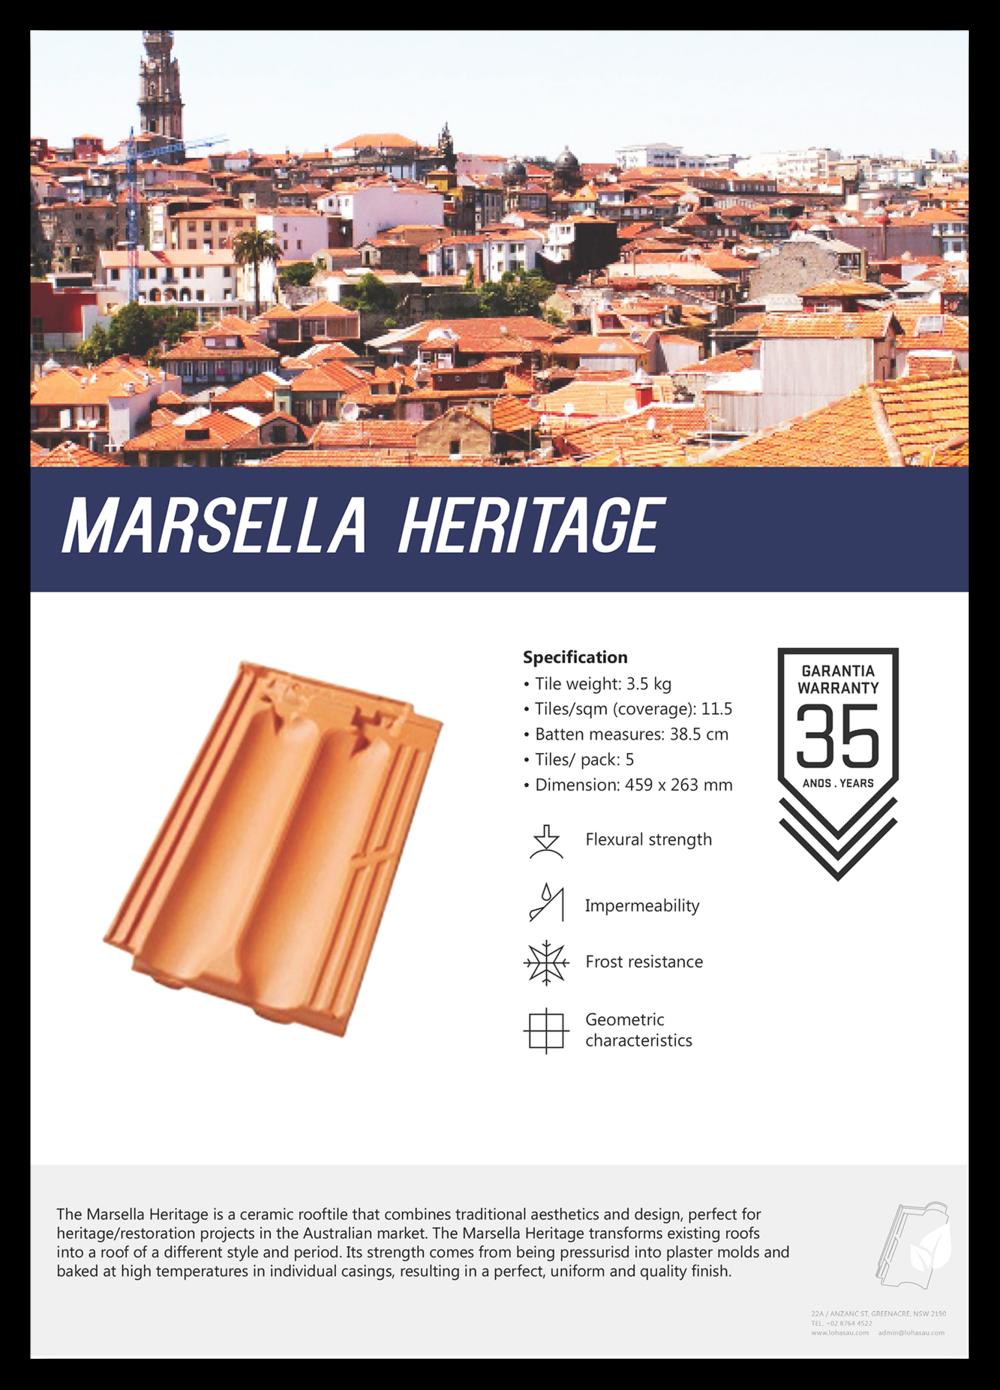 LOHAS_MARSELLA_HERITAGE_FLYER